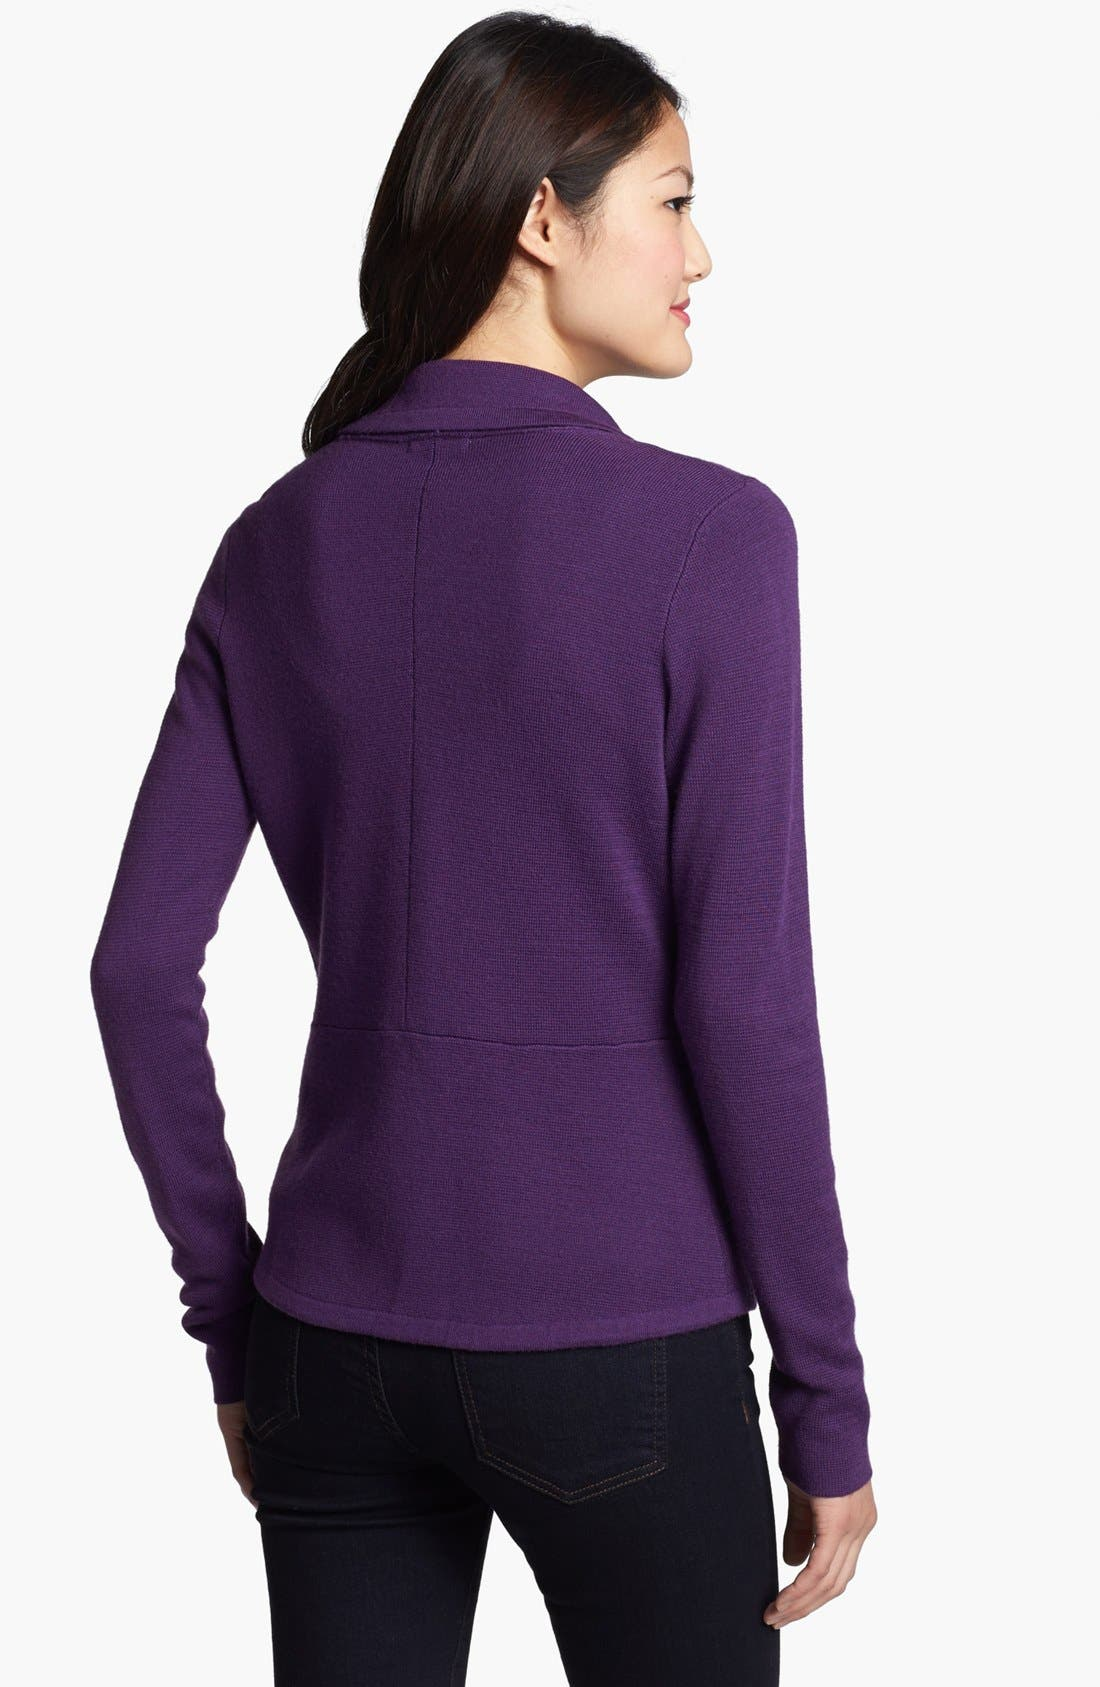 Alternate Image 1 Selected - Halogen® Sweater Jacket, Cardigan Leather Skirt & Caslon® Tee